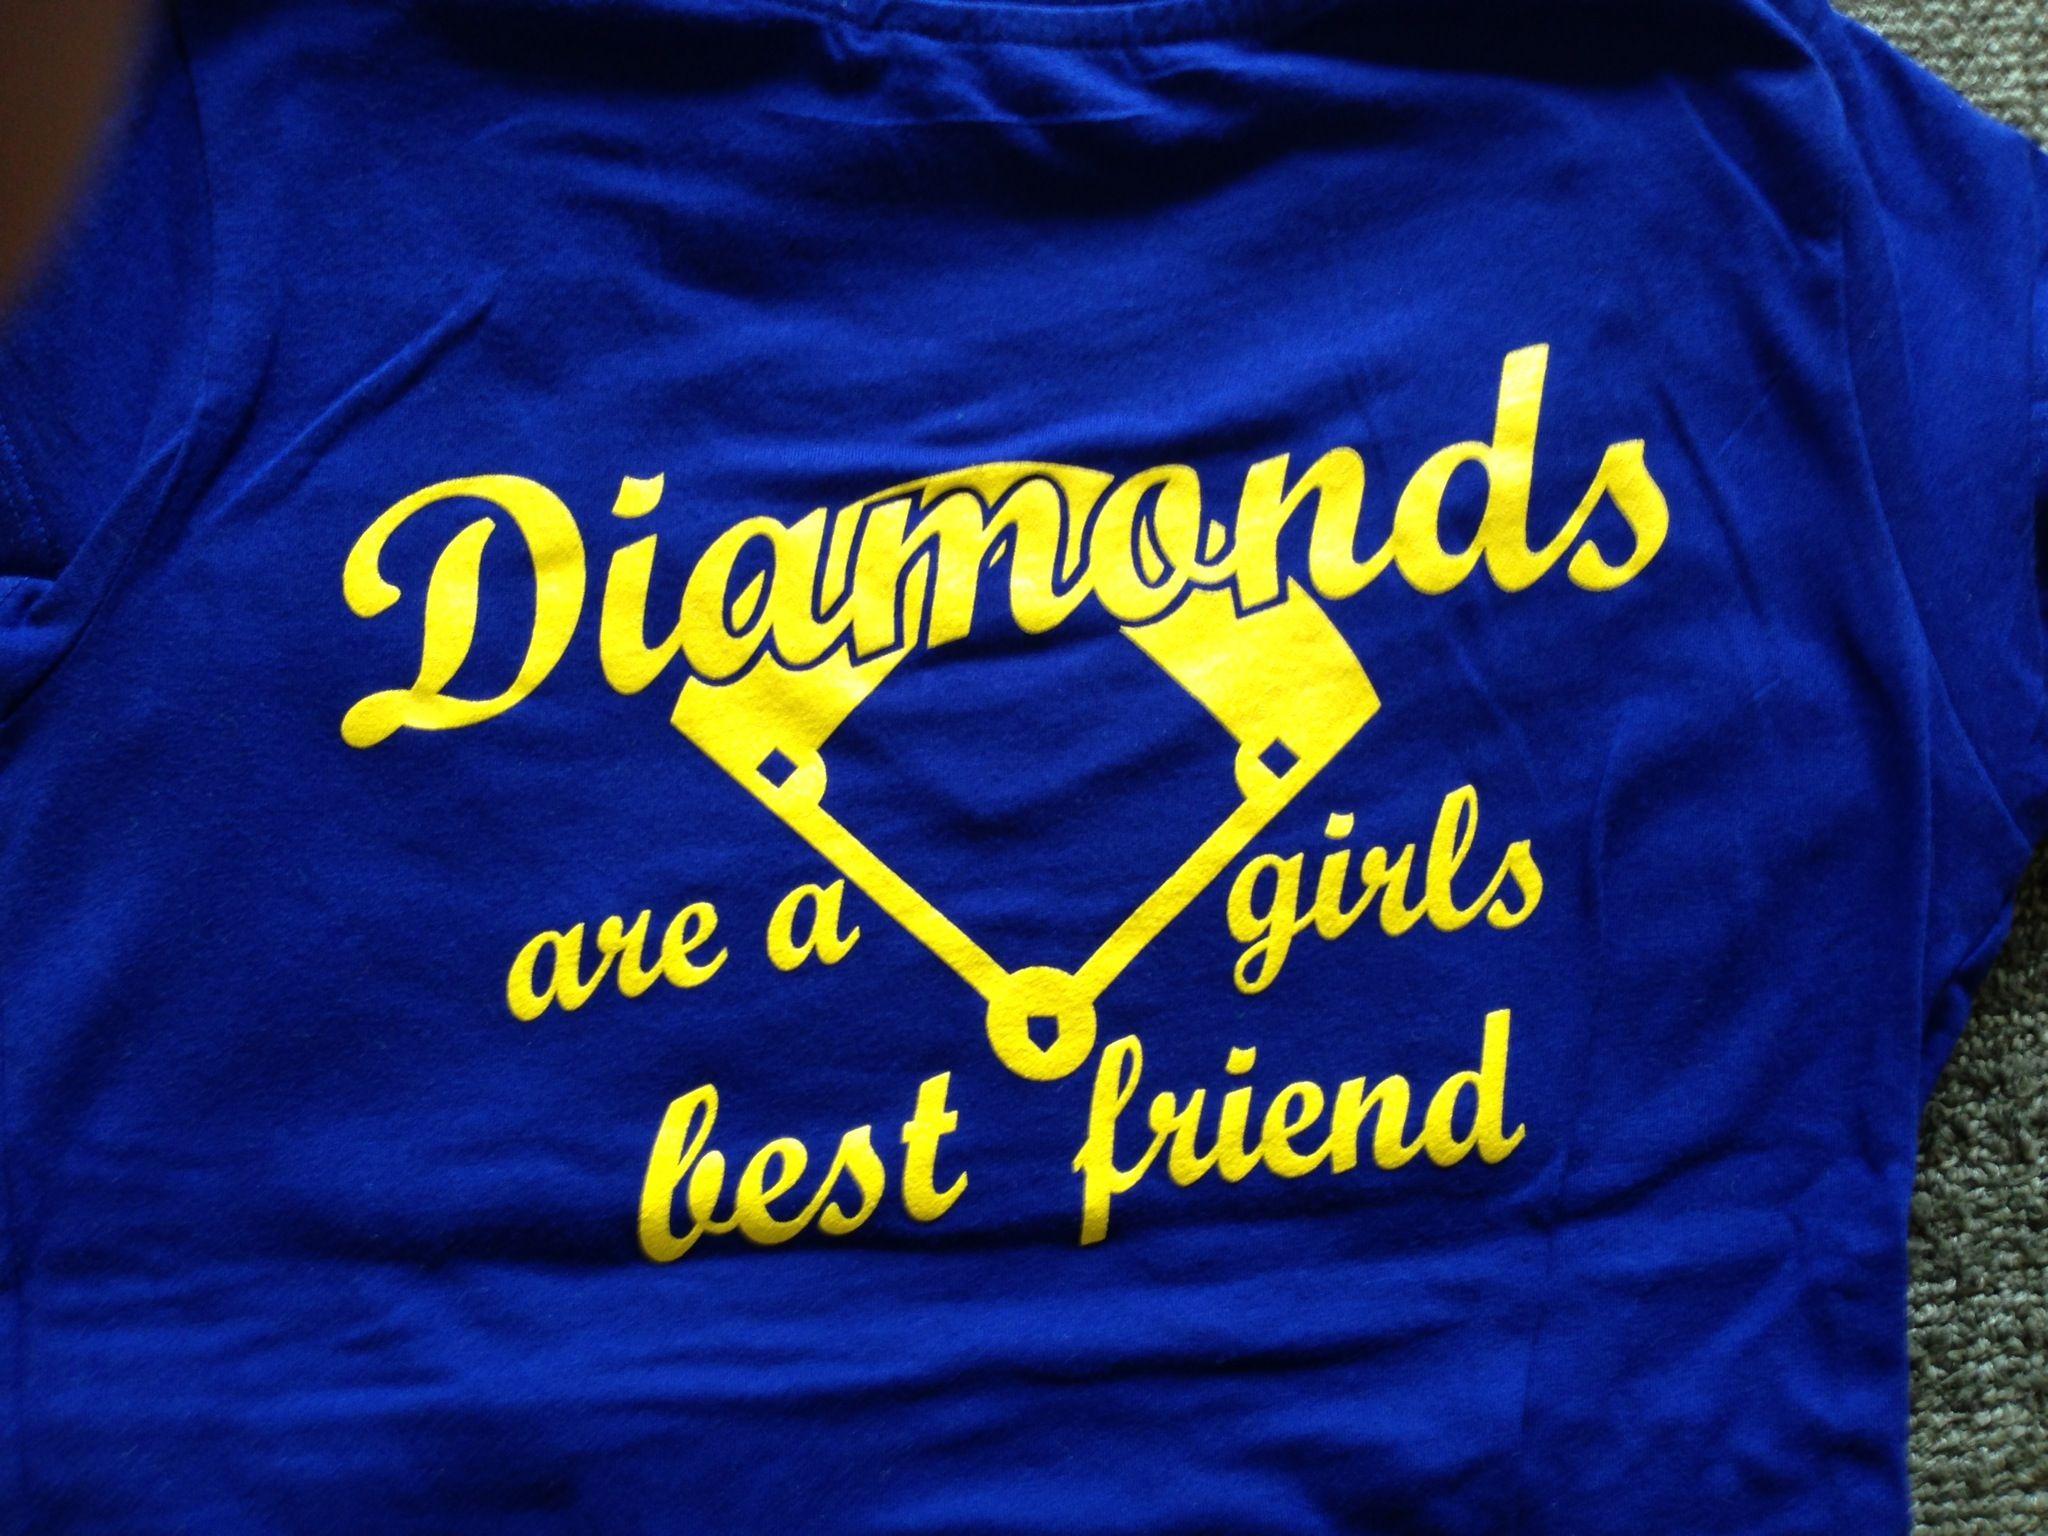 Diamonds are a girls best friend!